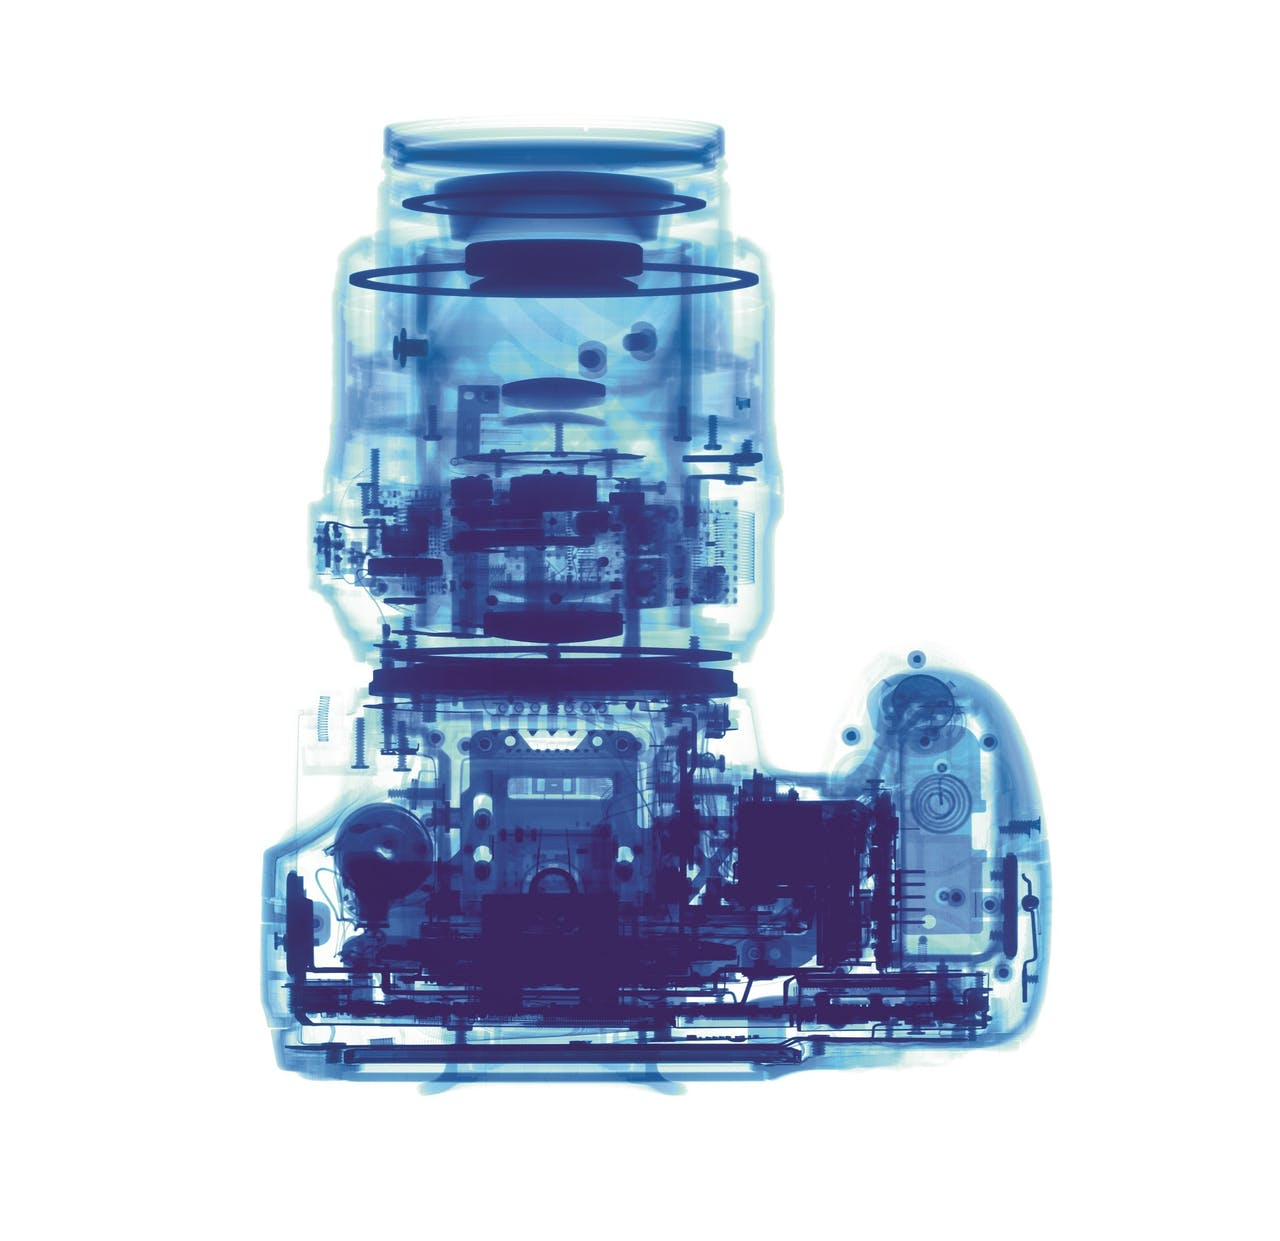 DSLR foto-camera